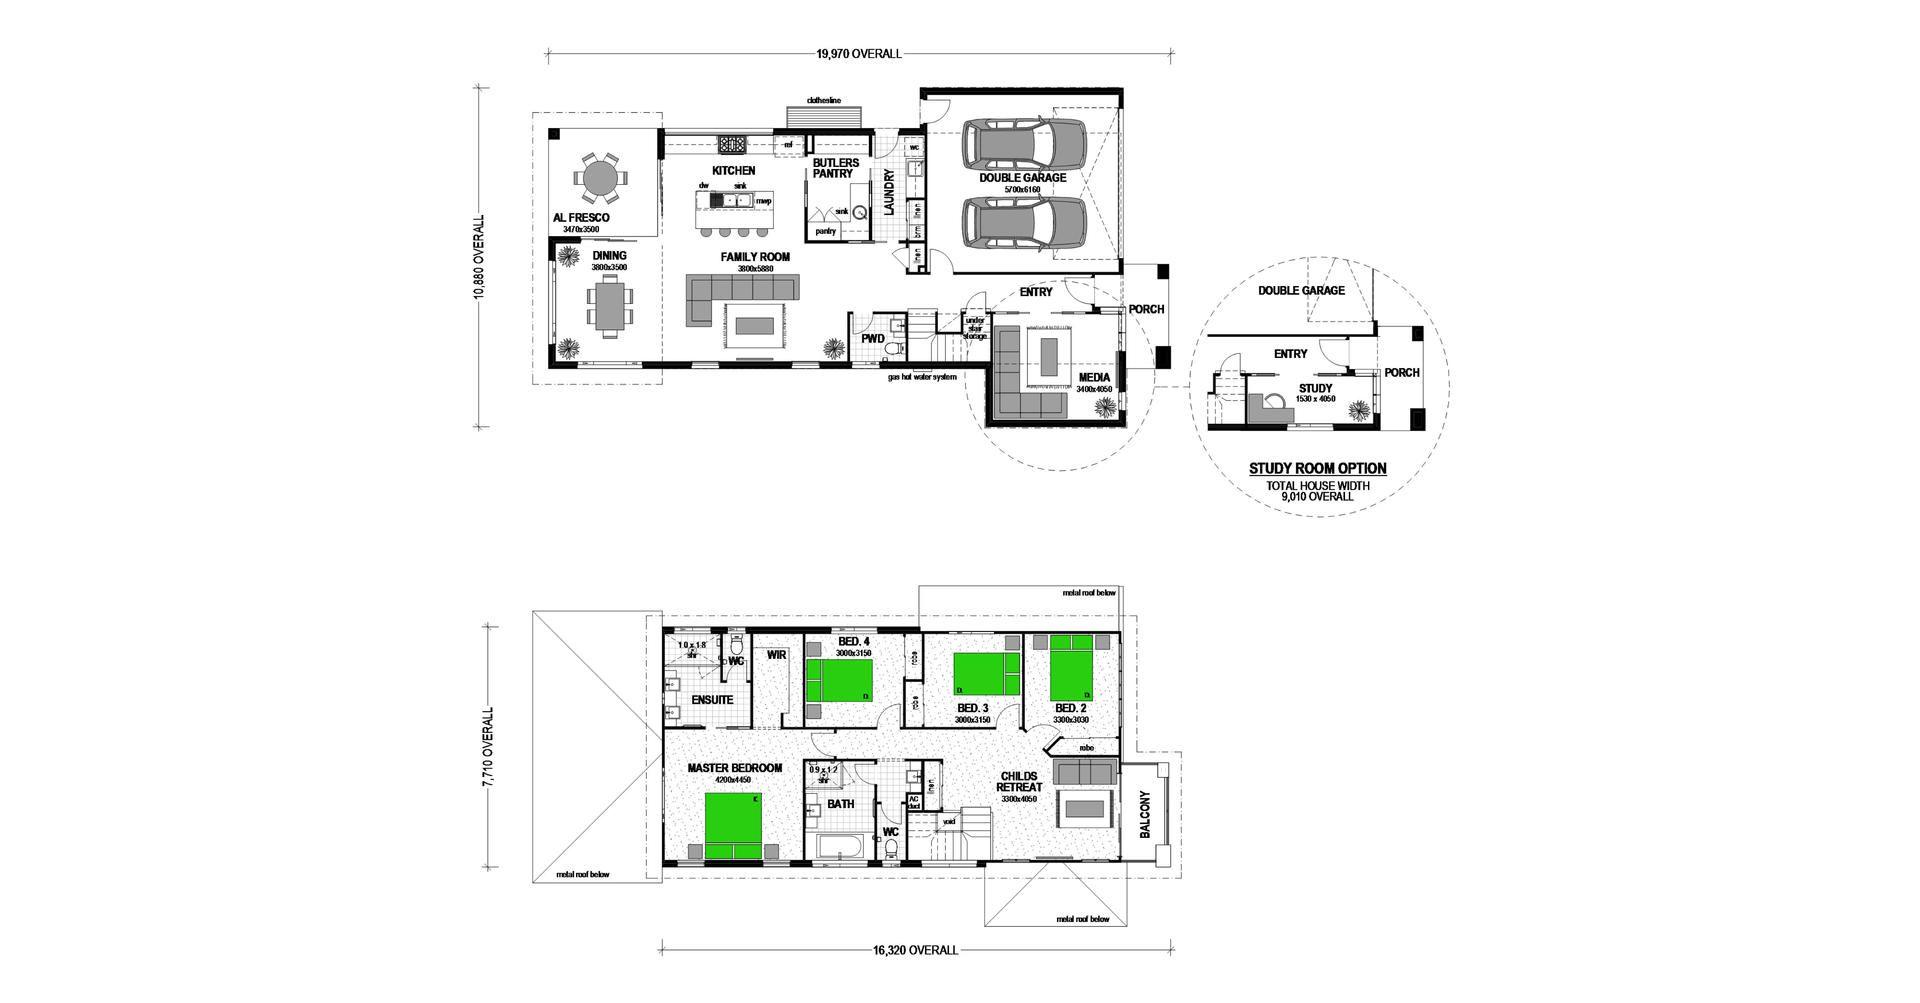 LOT 33 HEADLANDS ESPLANADE 'BARGARA HEADLANDS', Innes Park QLD 4670, Image 1